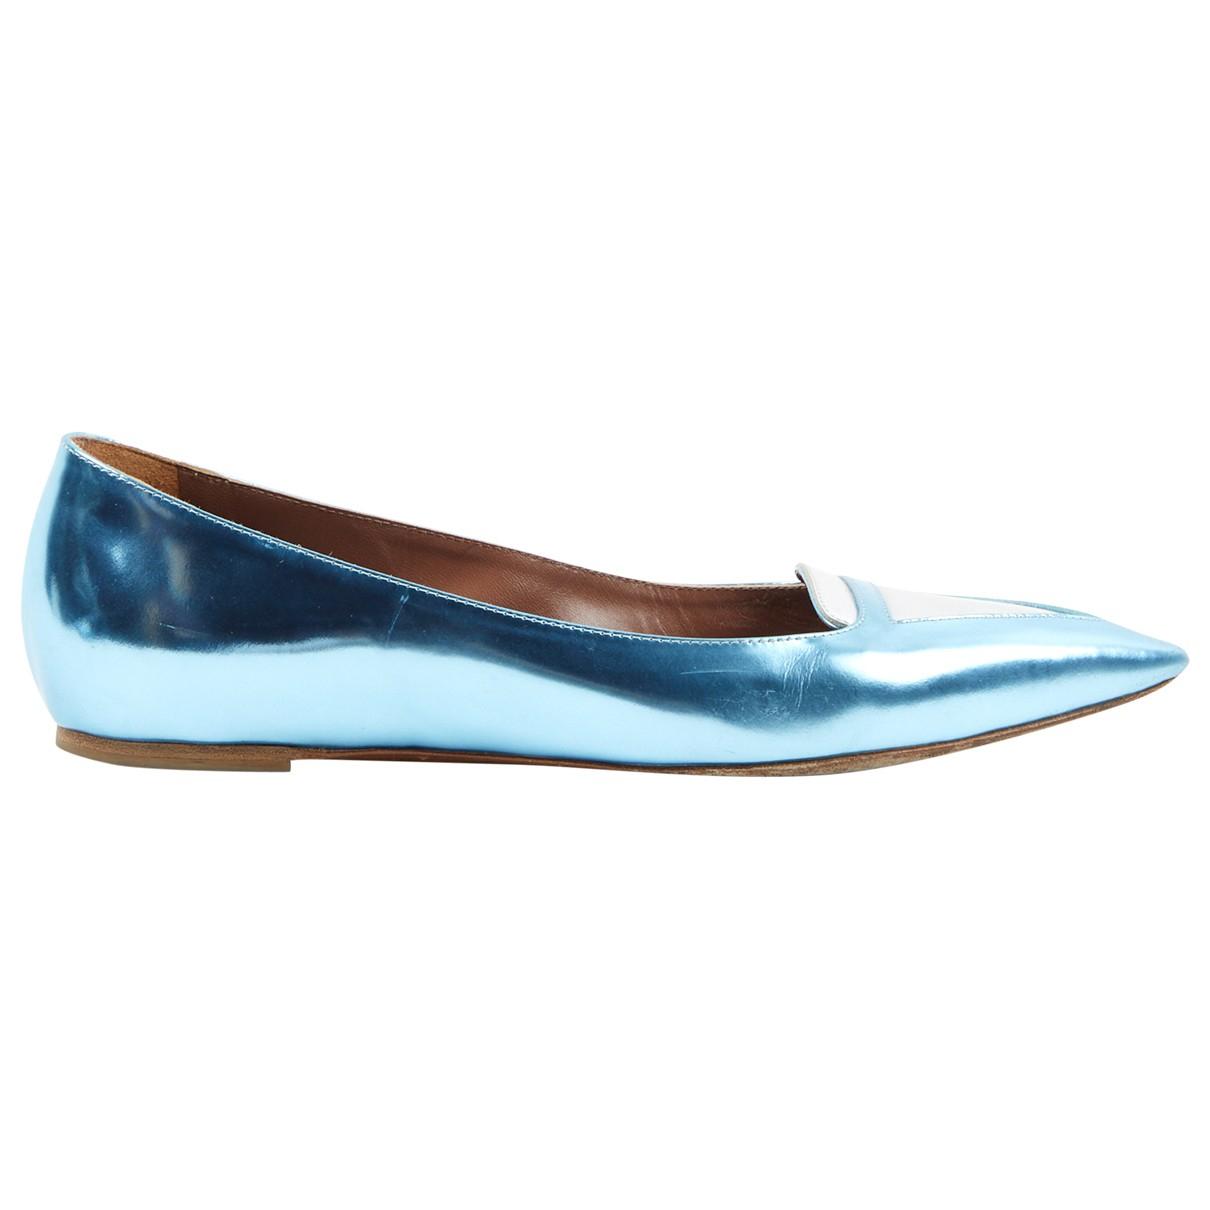 Tabitha Simmons \N Blue Leather Ballet flats for Women 39 EU